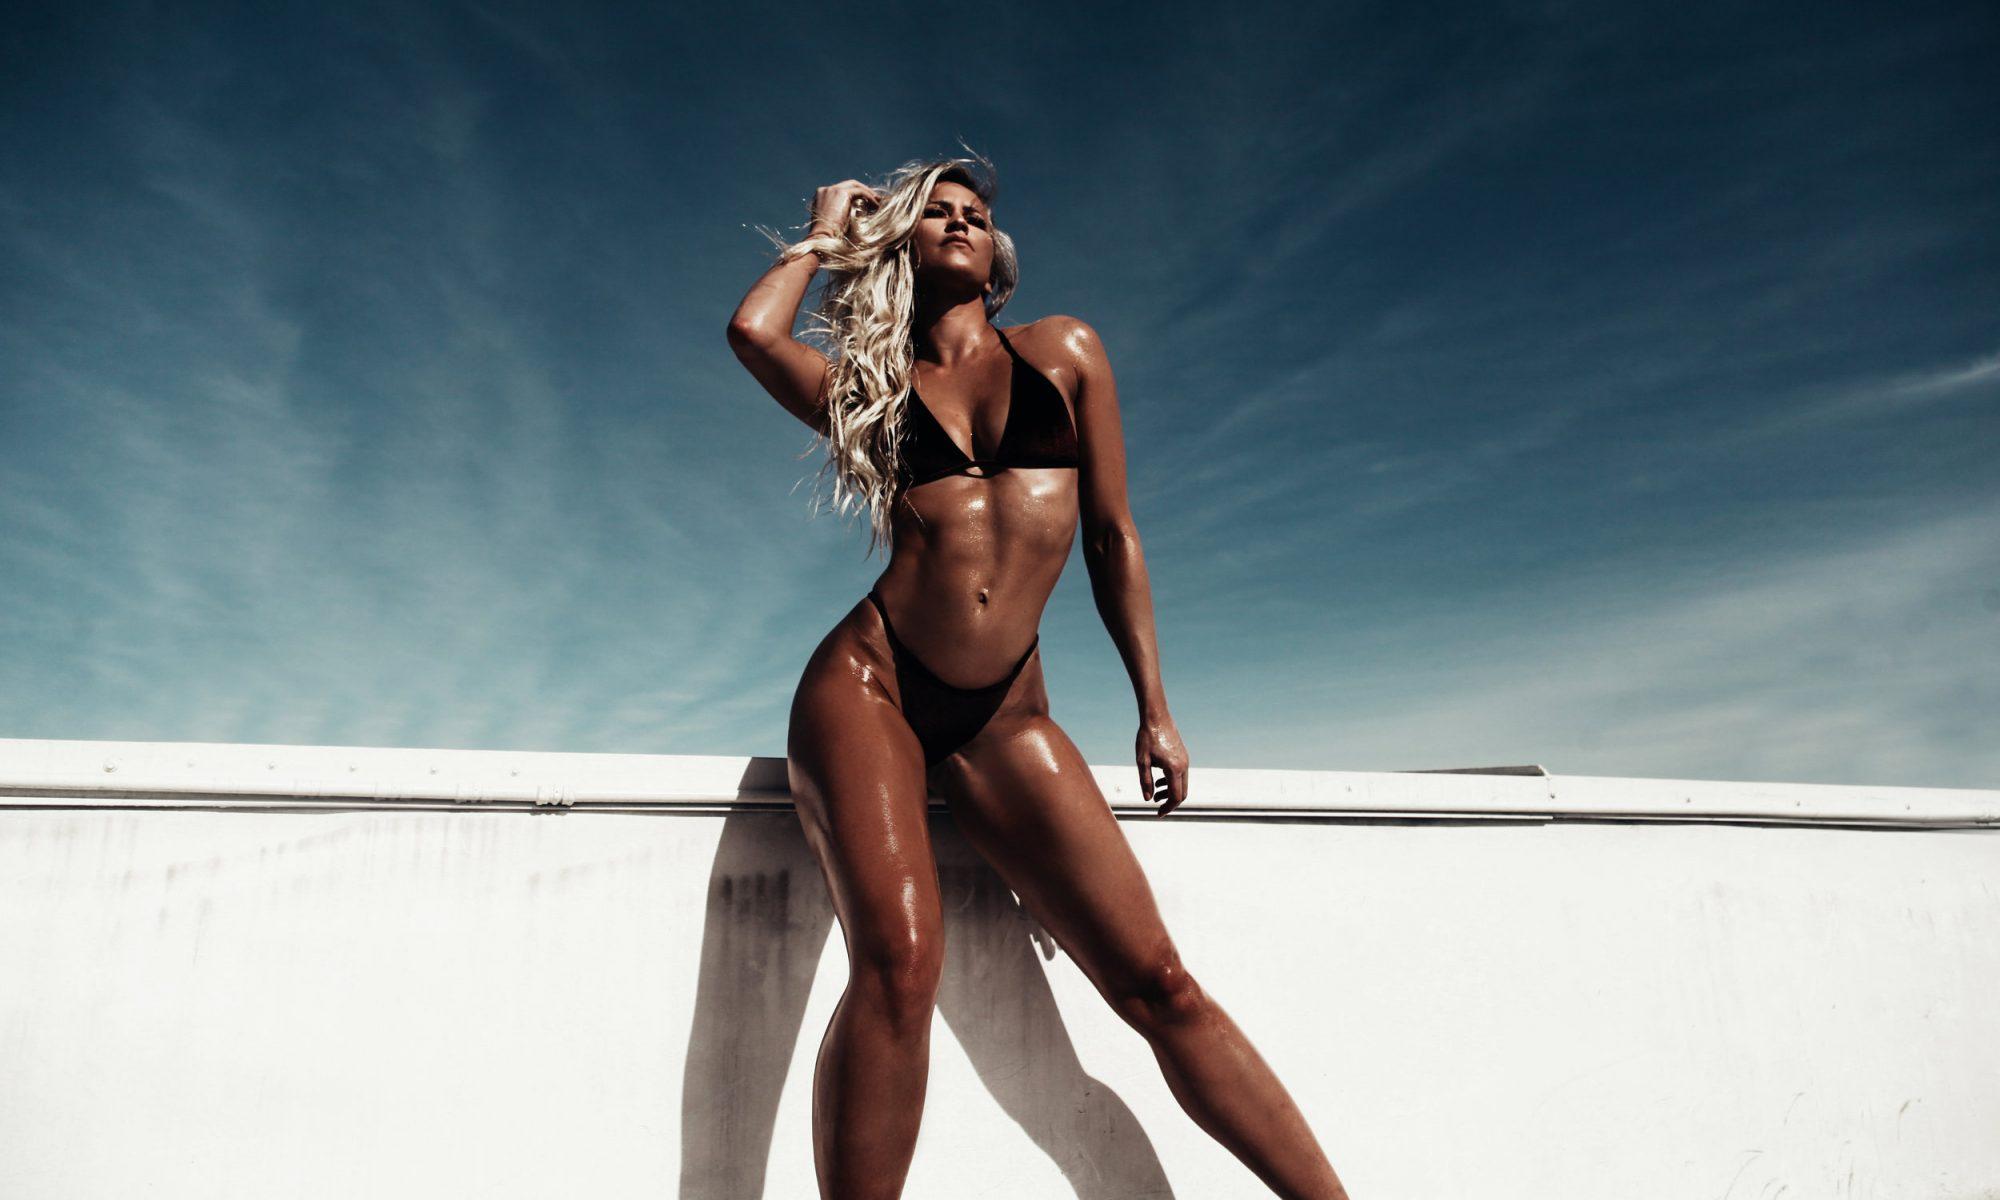 Summer-Rae.com